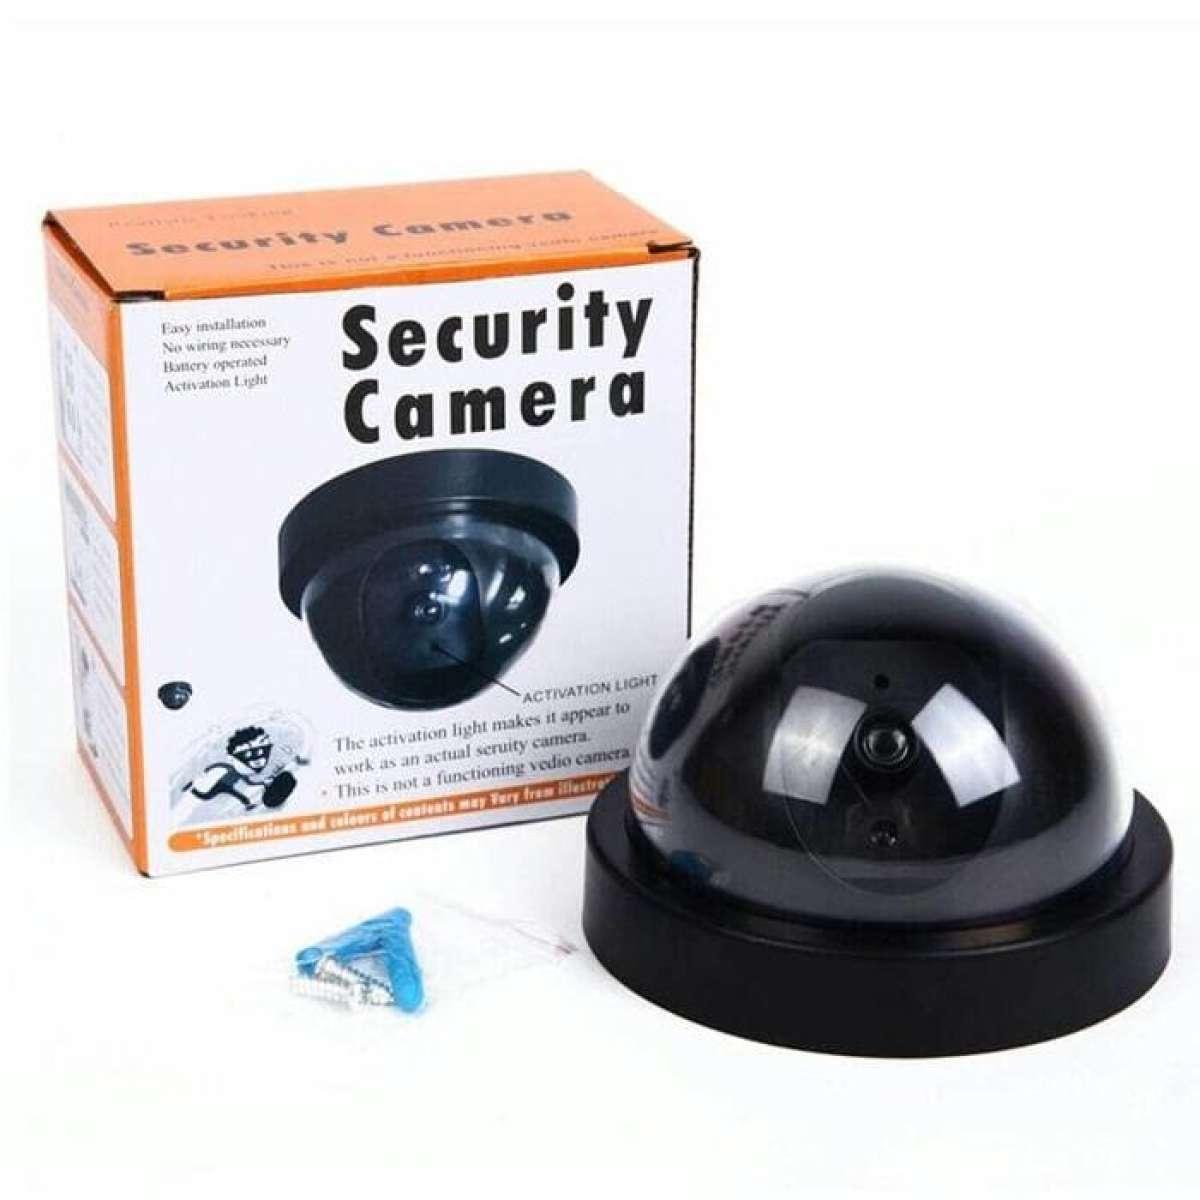 Eigia CCTV Dummy Lampu LED Kedip Fake Security Camera Anti Maling CCTV Palsu Replika Mirip Asli